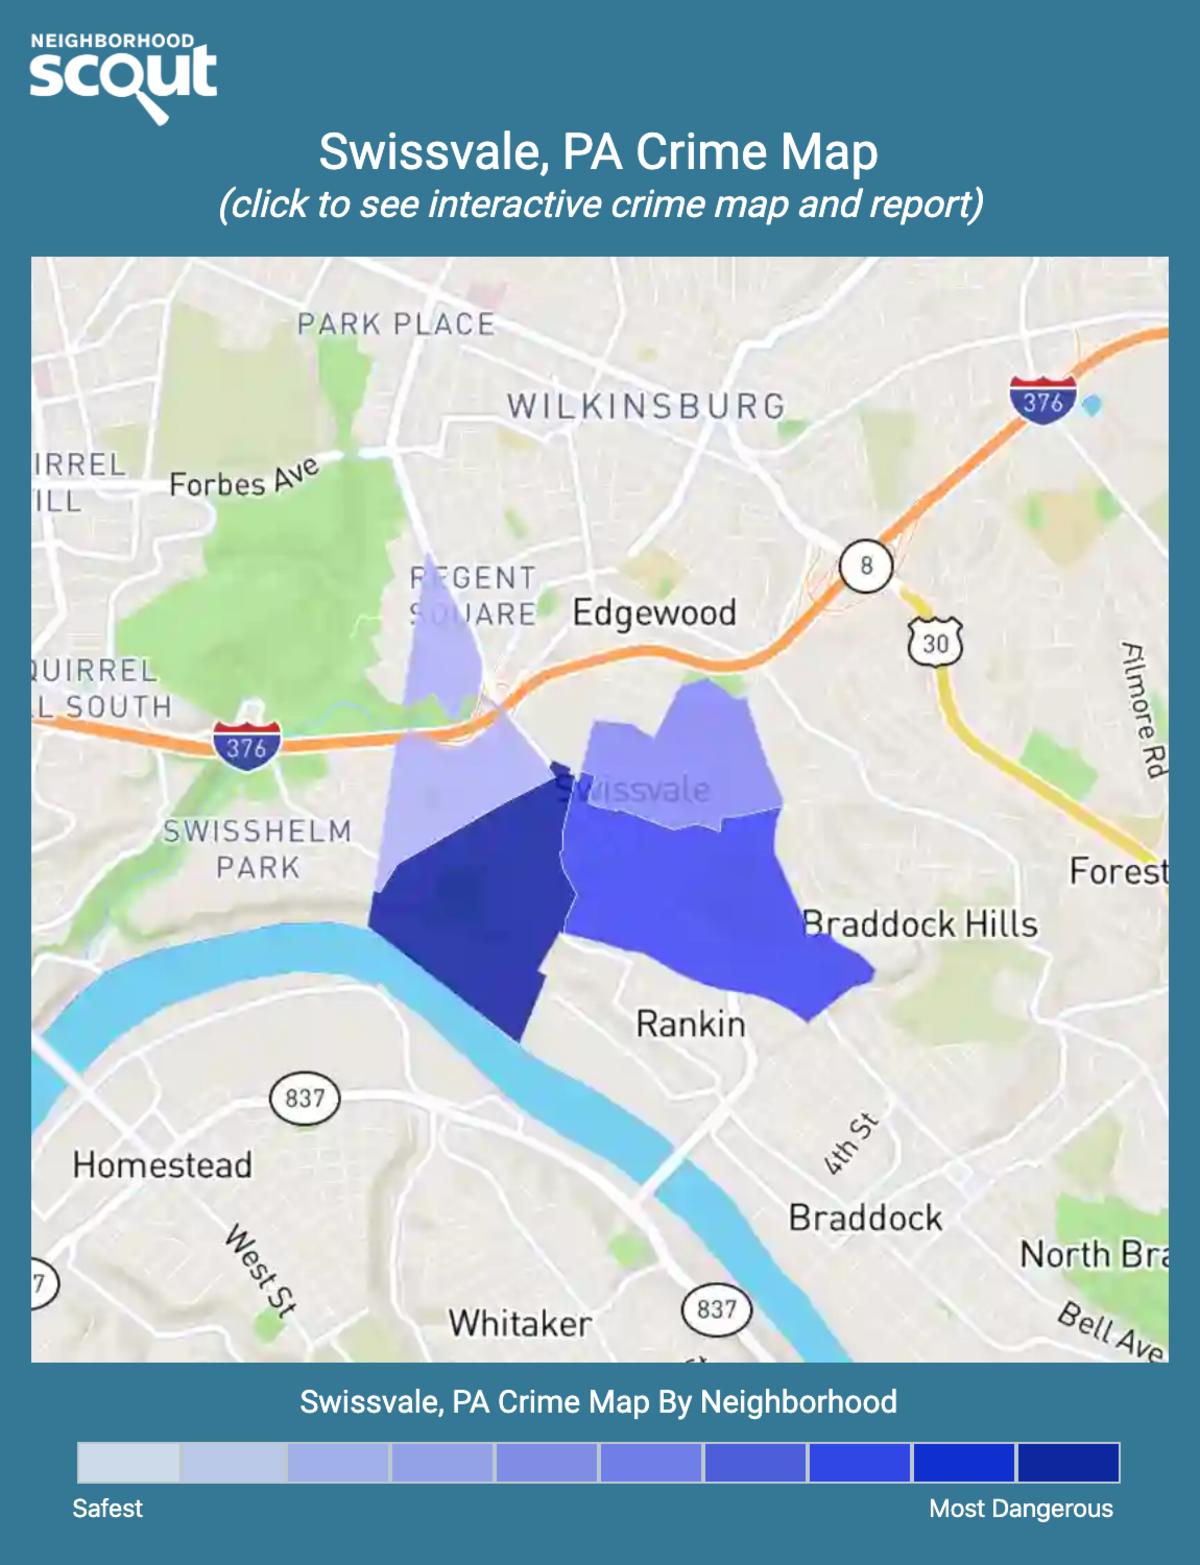 Swissvale, Pennsylvania crime map